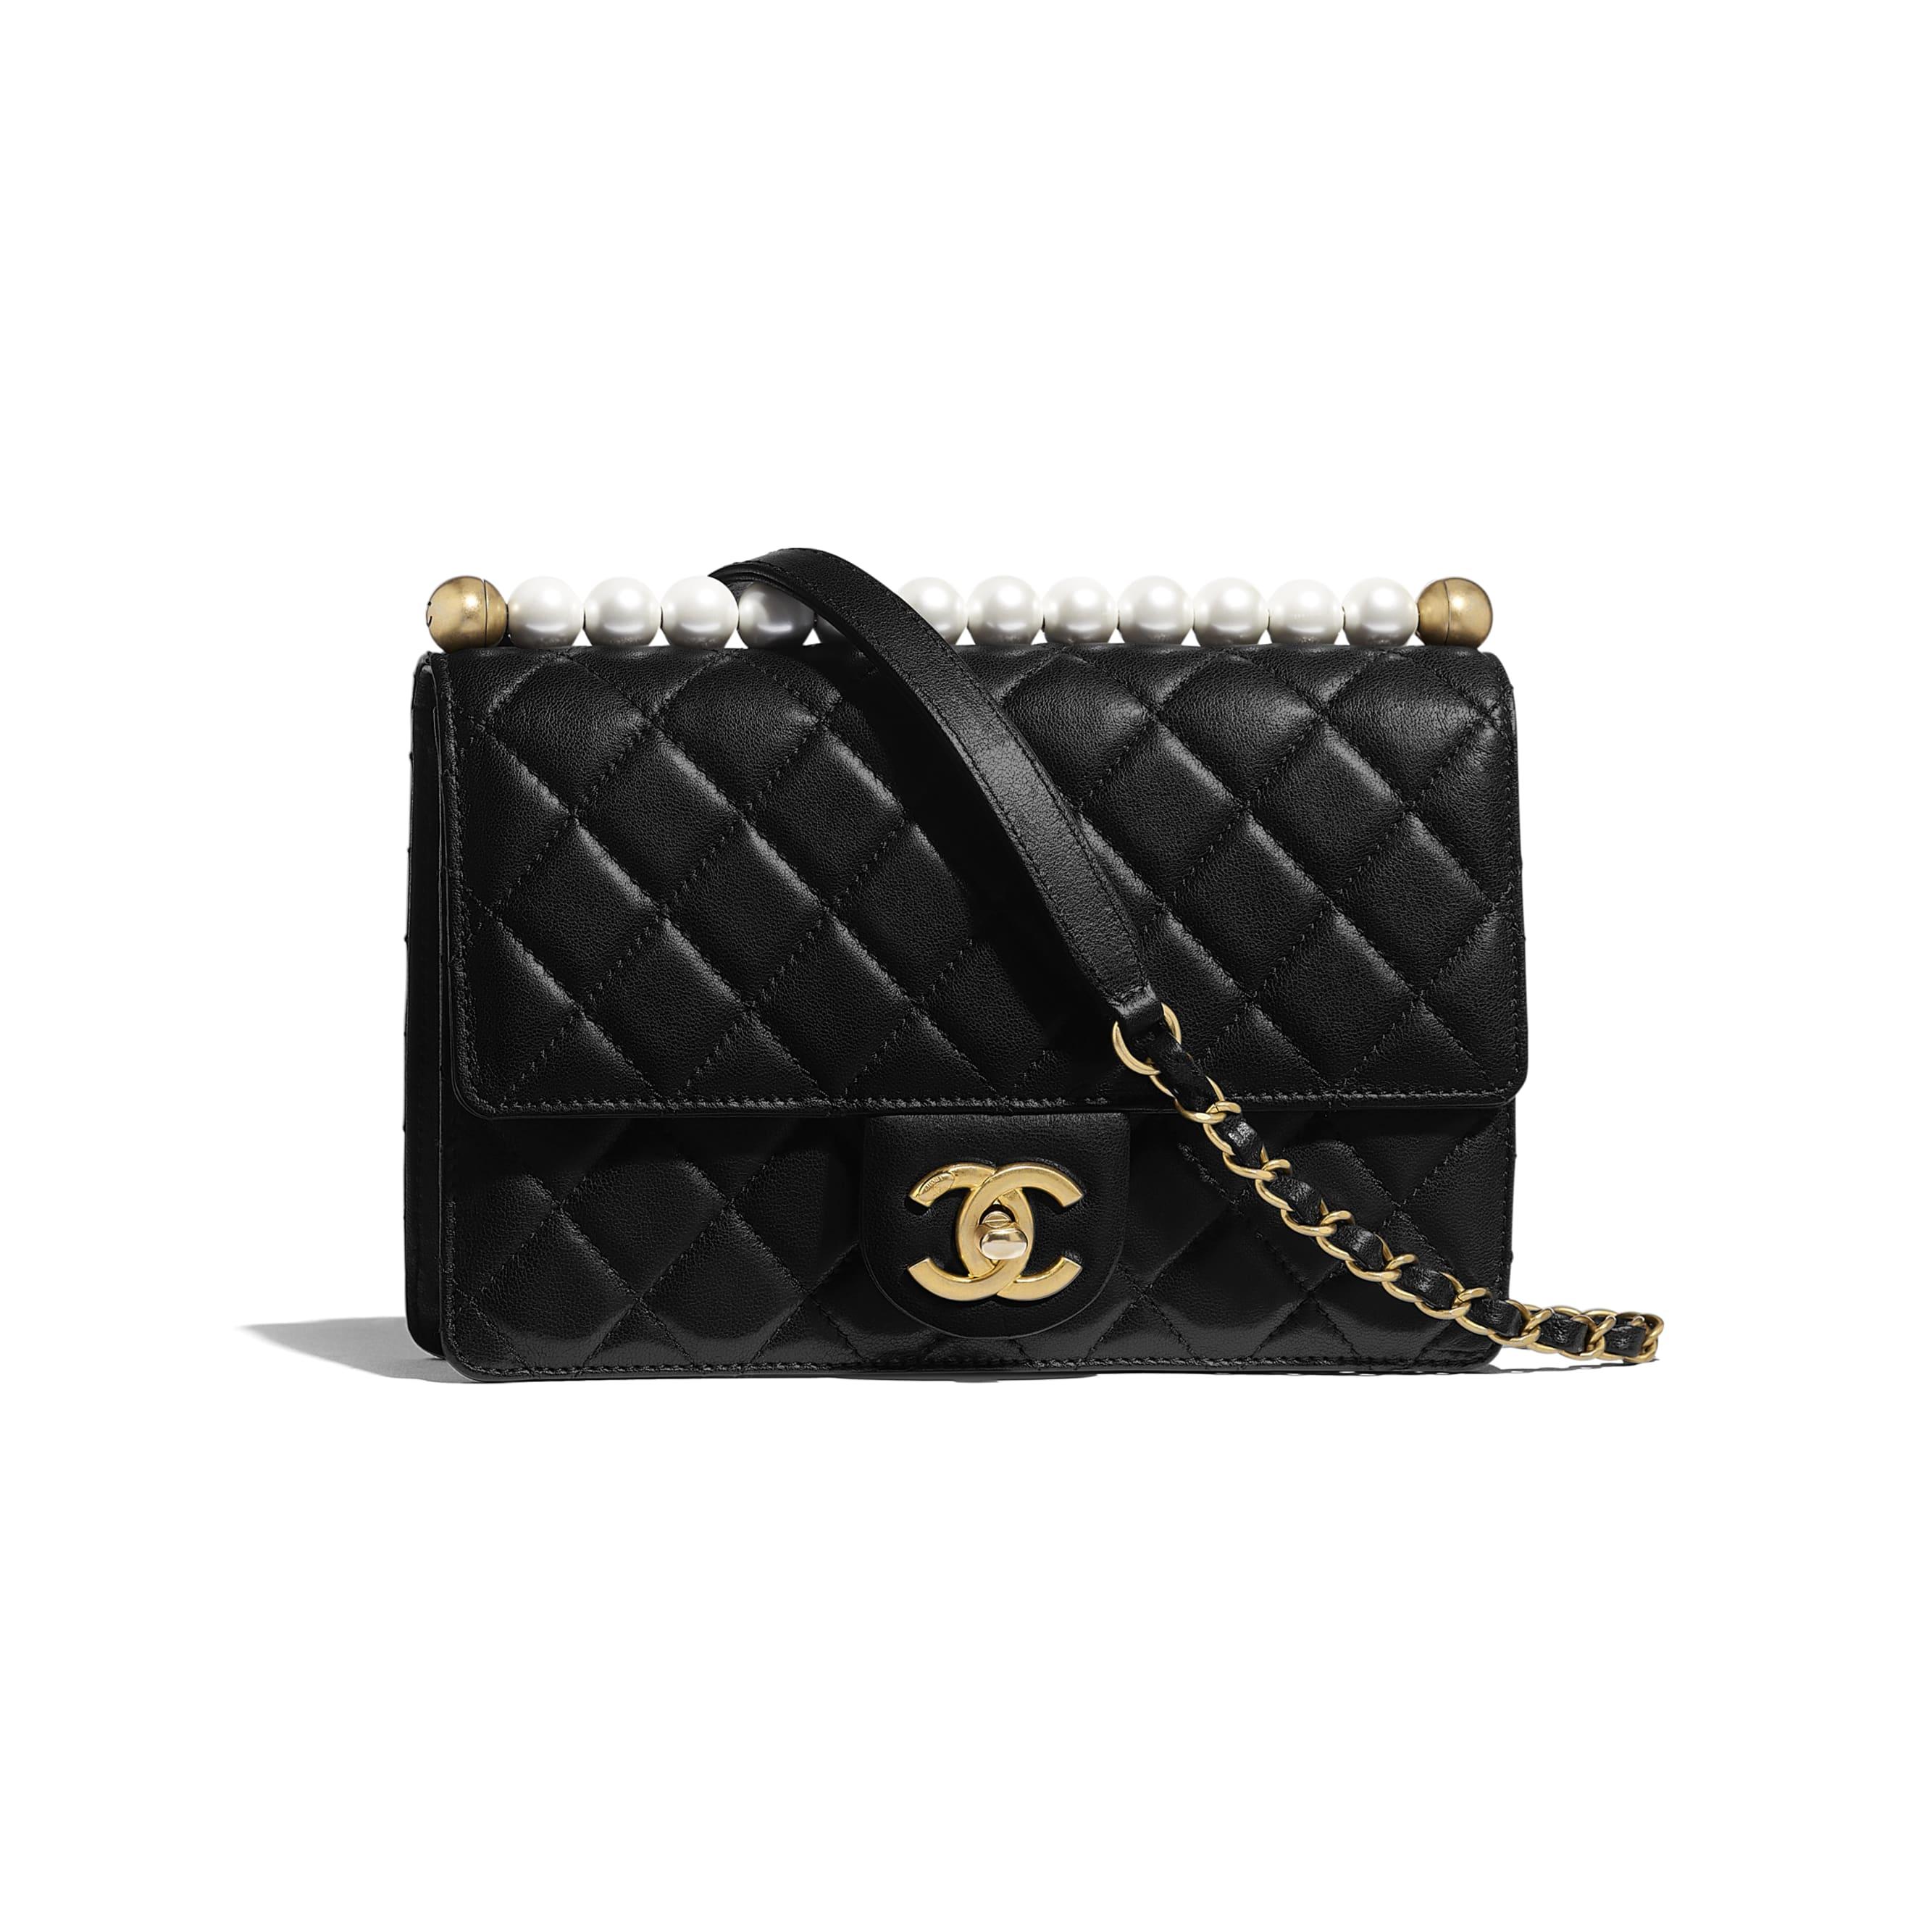 Flap Bag - Black - Lambskin, Imitation Pearls & Gold-Tone Metal - Default view - see standard sized version